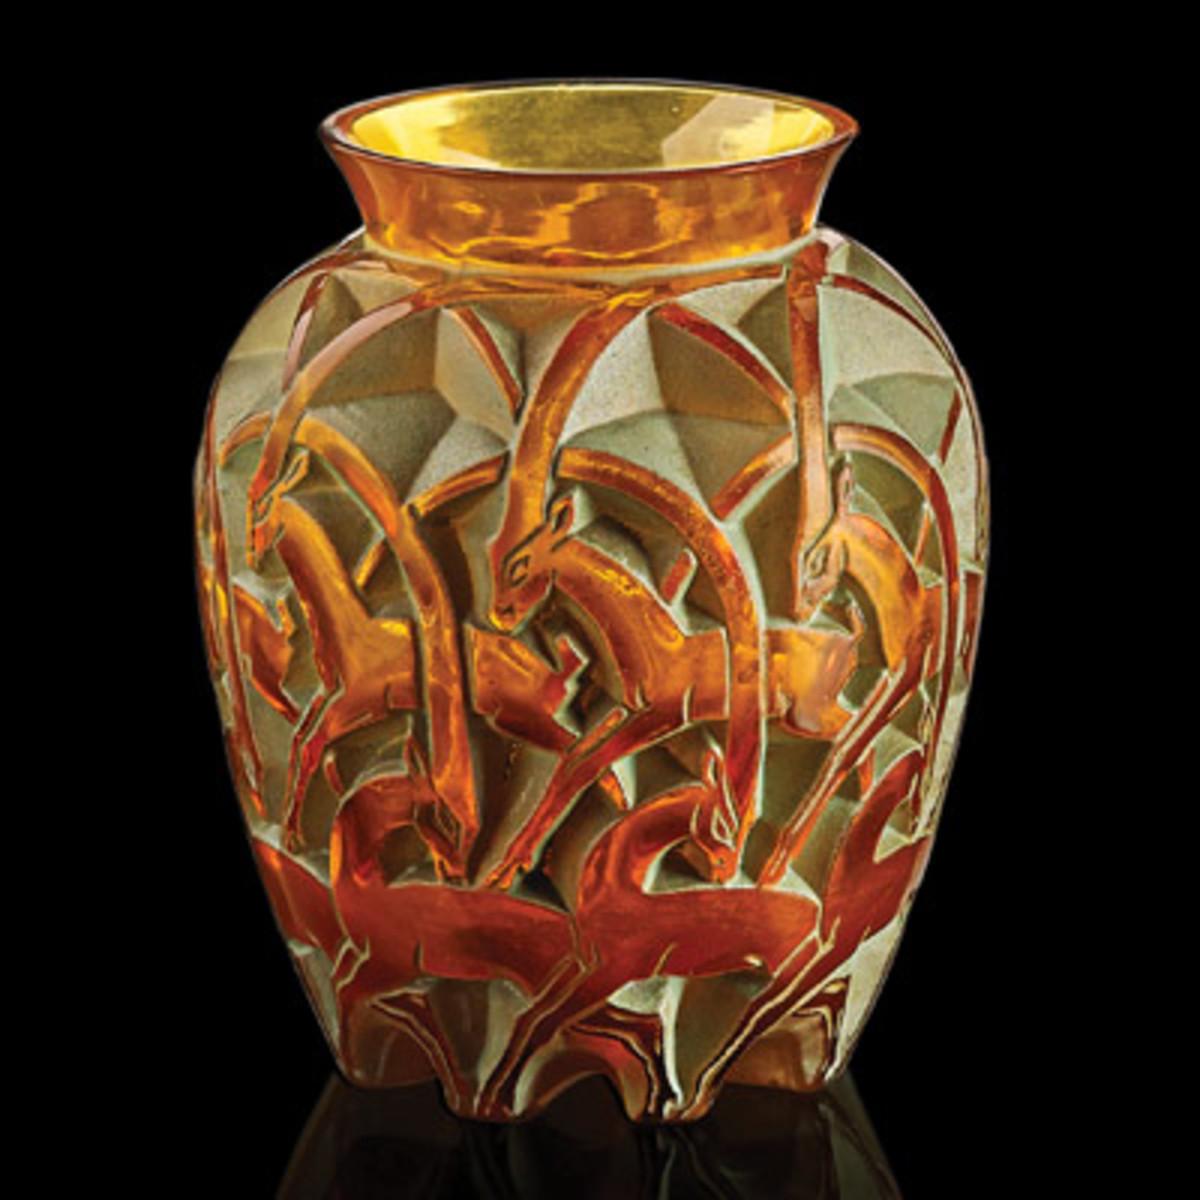 Chamois vase